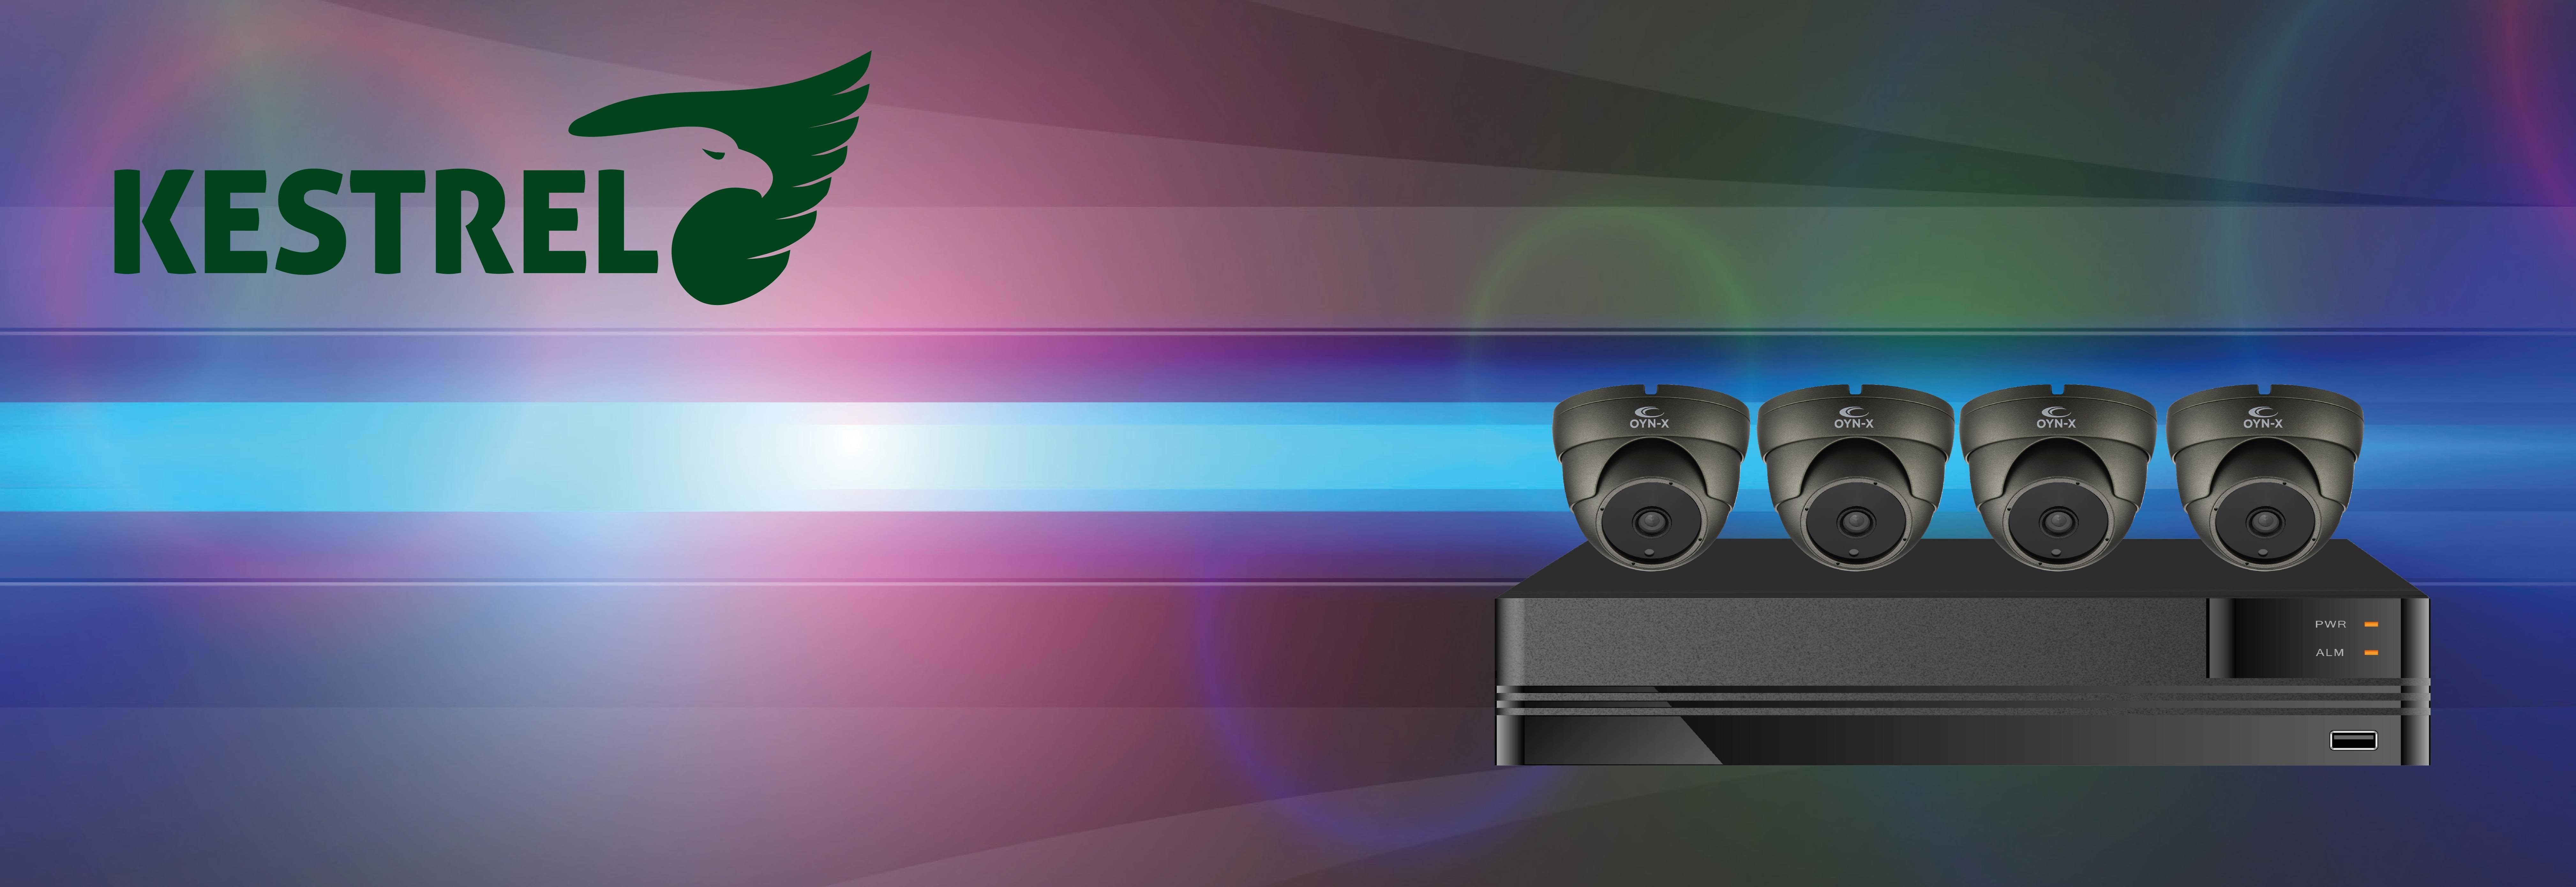 Alert Electrical - OYN-X Kestrel 5MP Analogue CCTV Systems